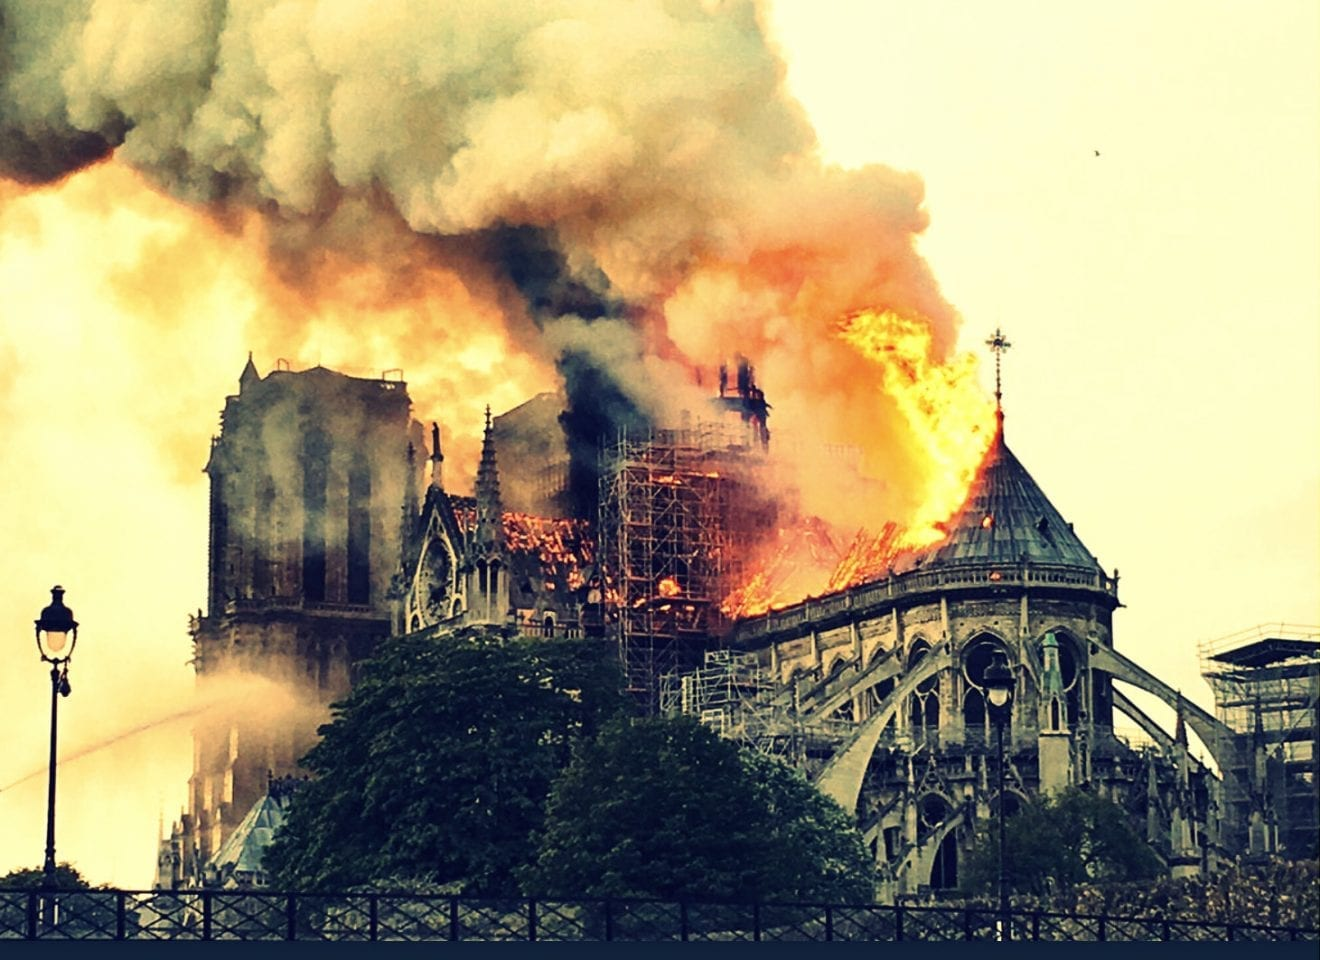 Notre Dame: Christianity desecrated in Europe, 1000 churches vandalized in France alone 2018, Hanne Nabintu Herland, WND